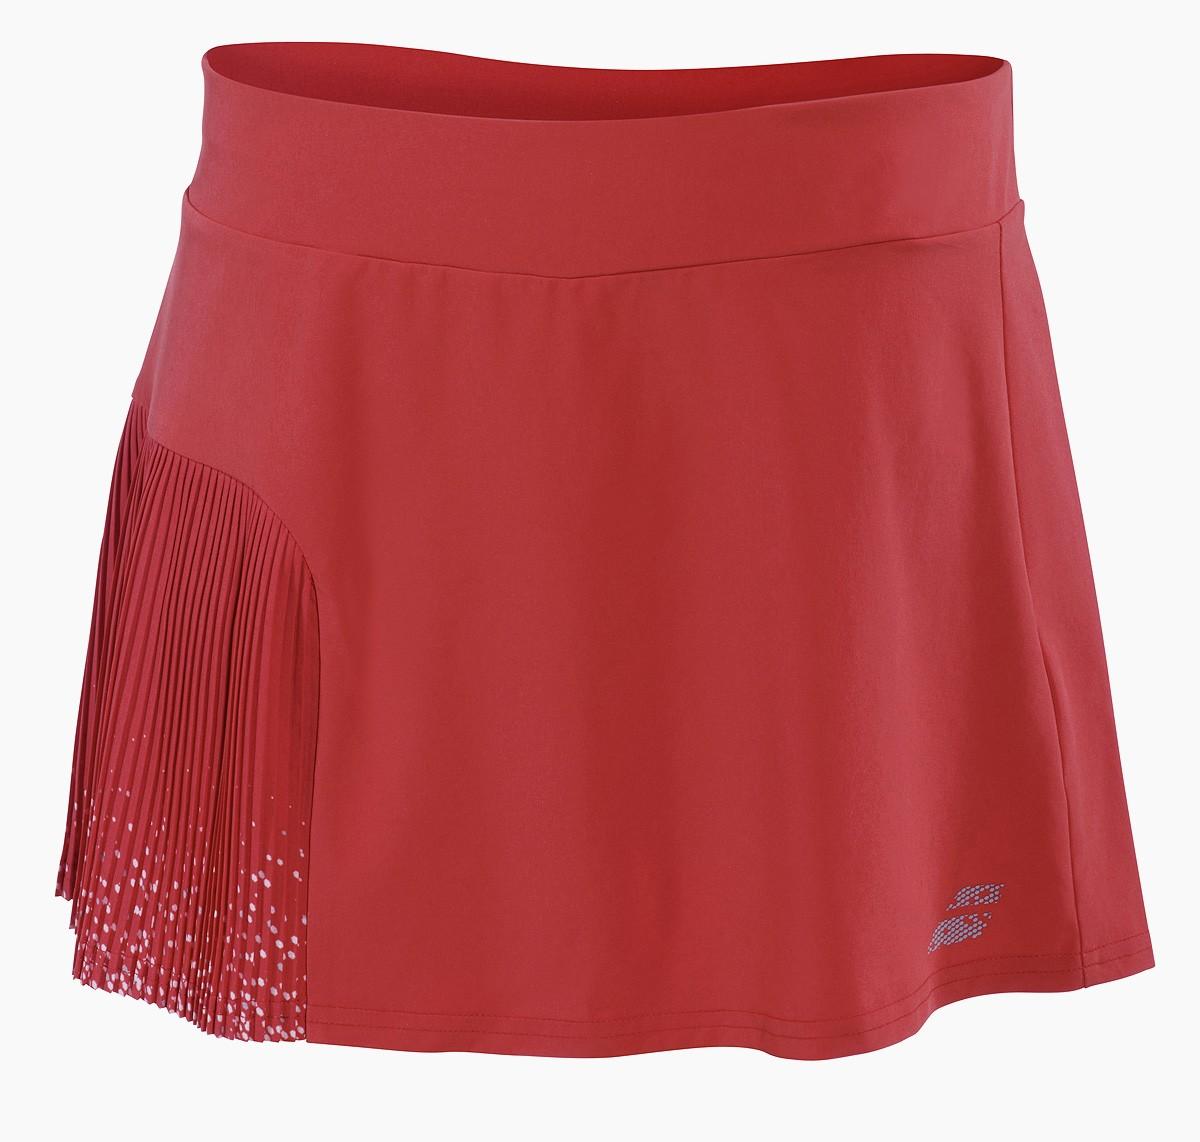 Spódniczka tenisowa Babolat PERF Skirt Hibiscus - 50%